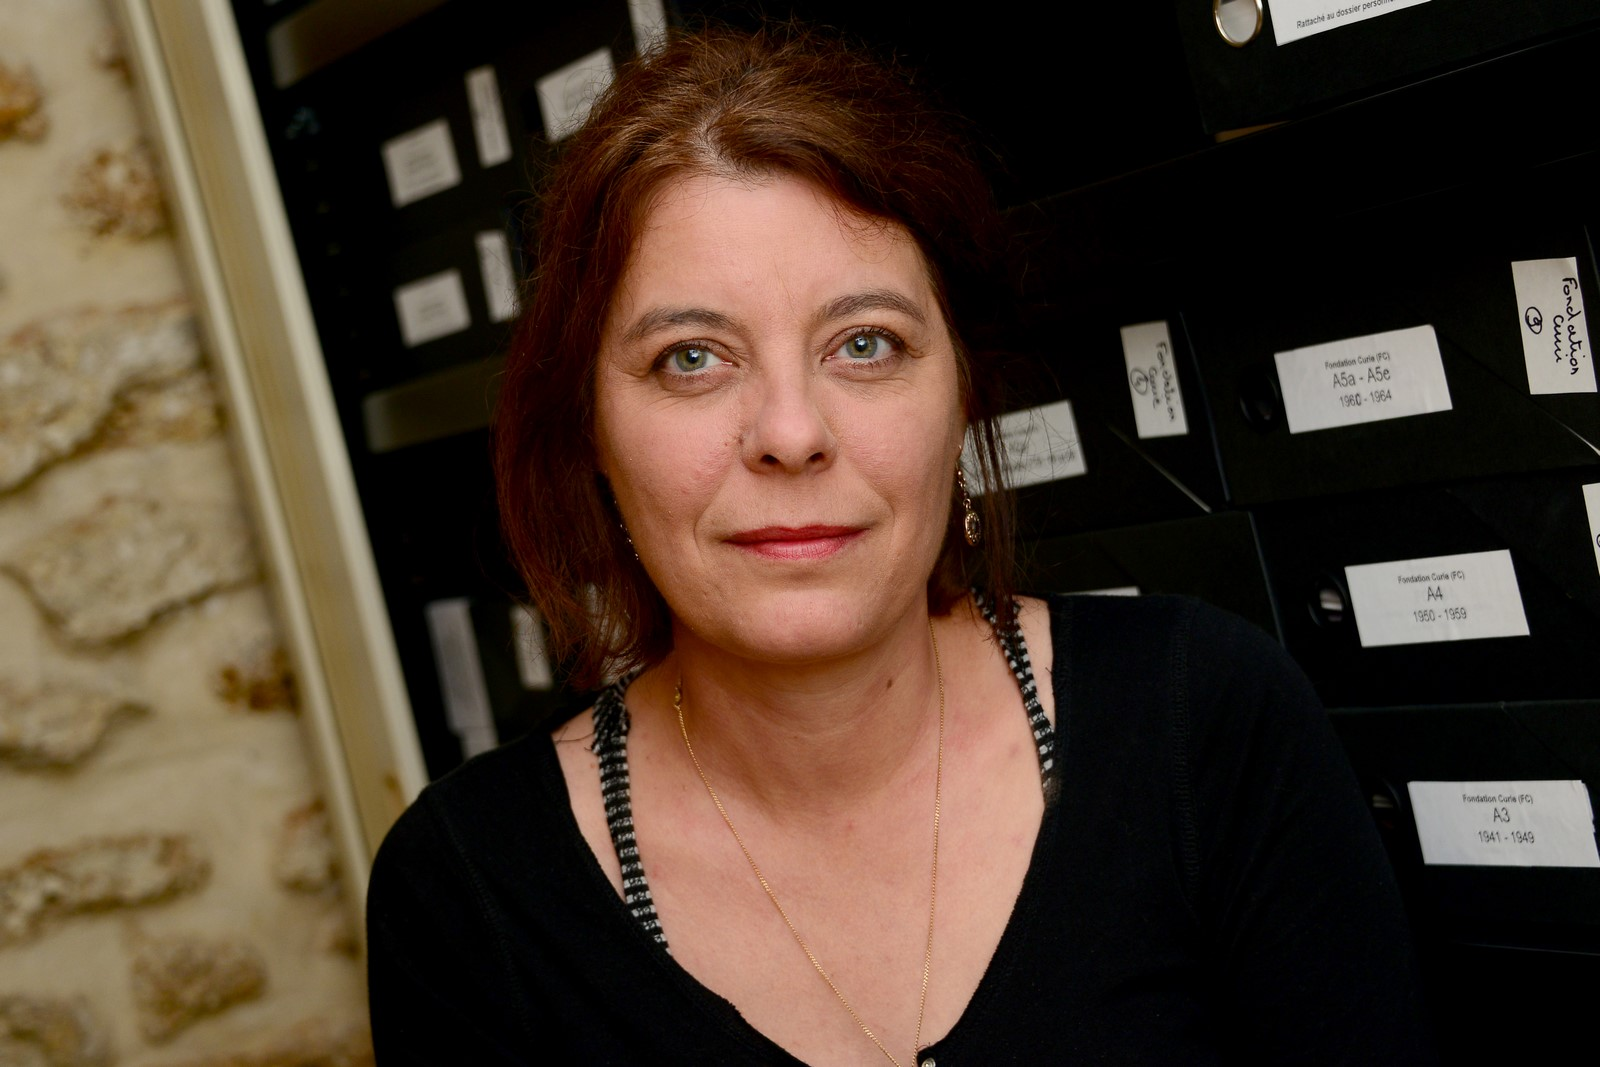 Natalie Pigeard-Micault